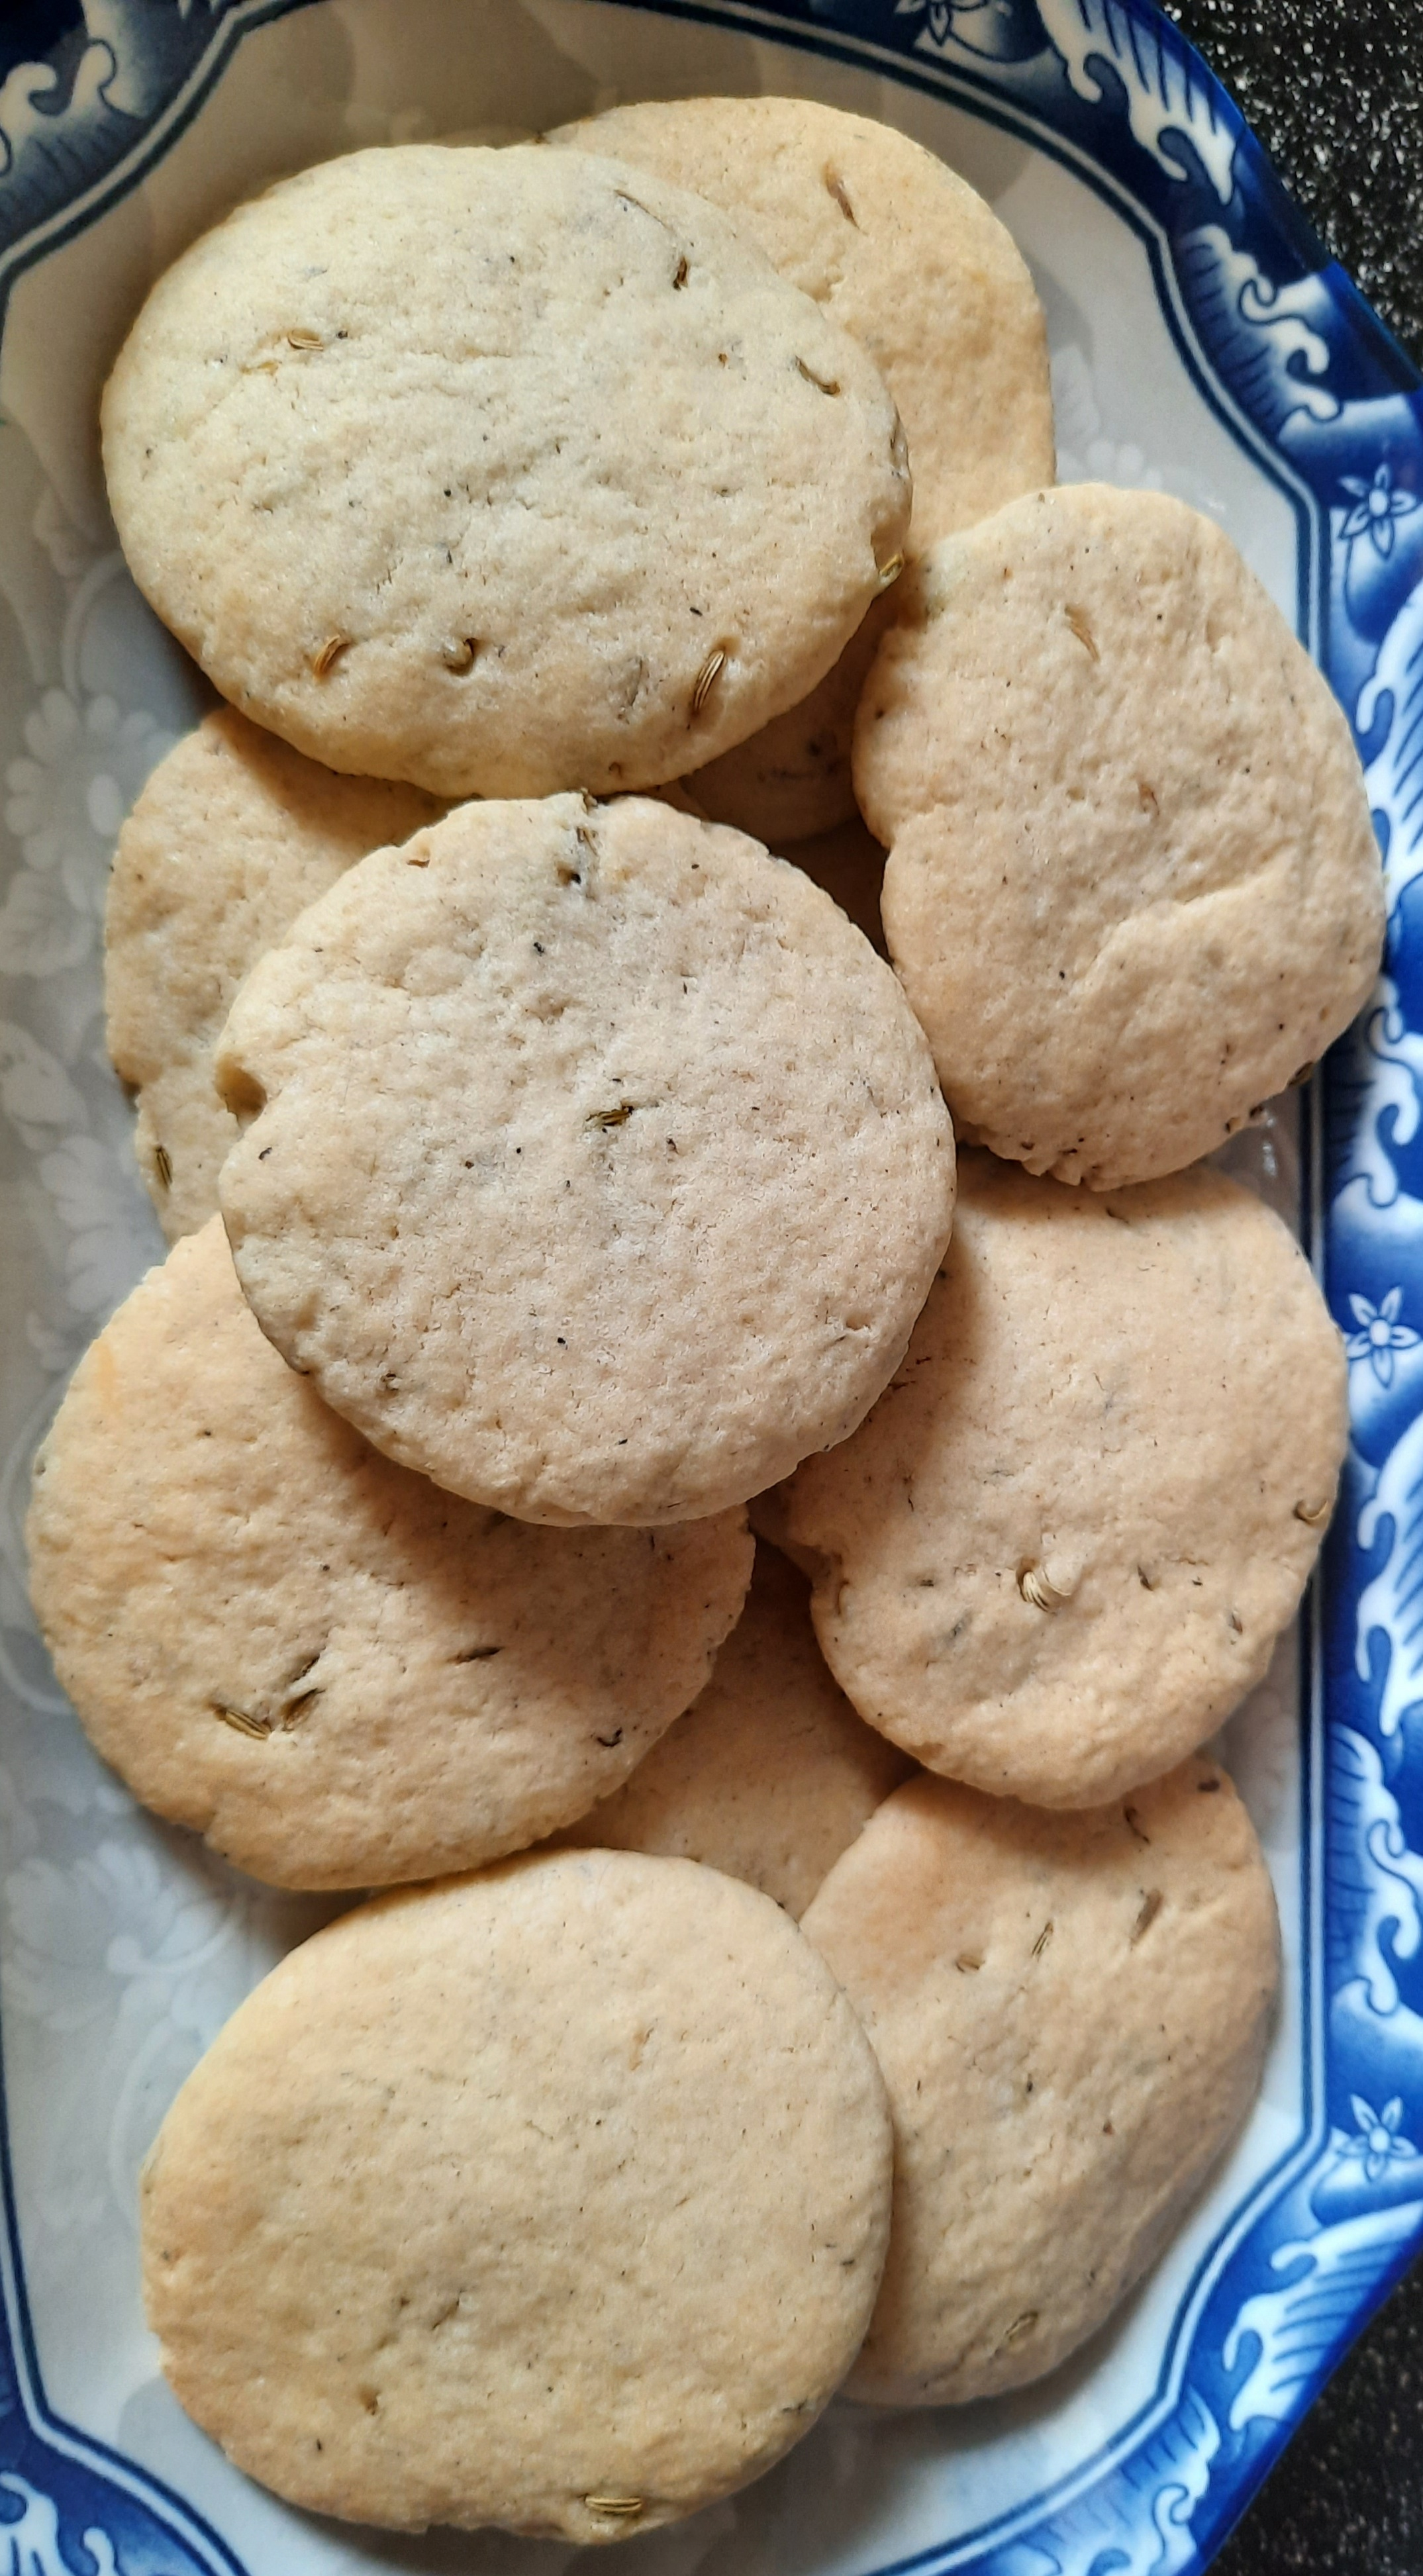 Anise Seed Borrachio Cookies